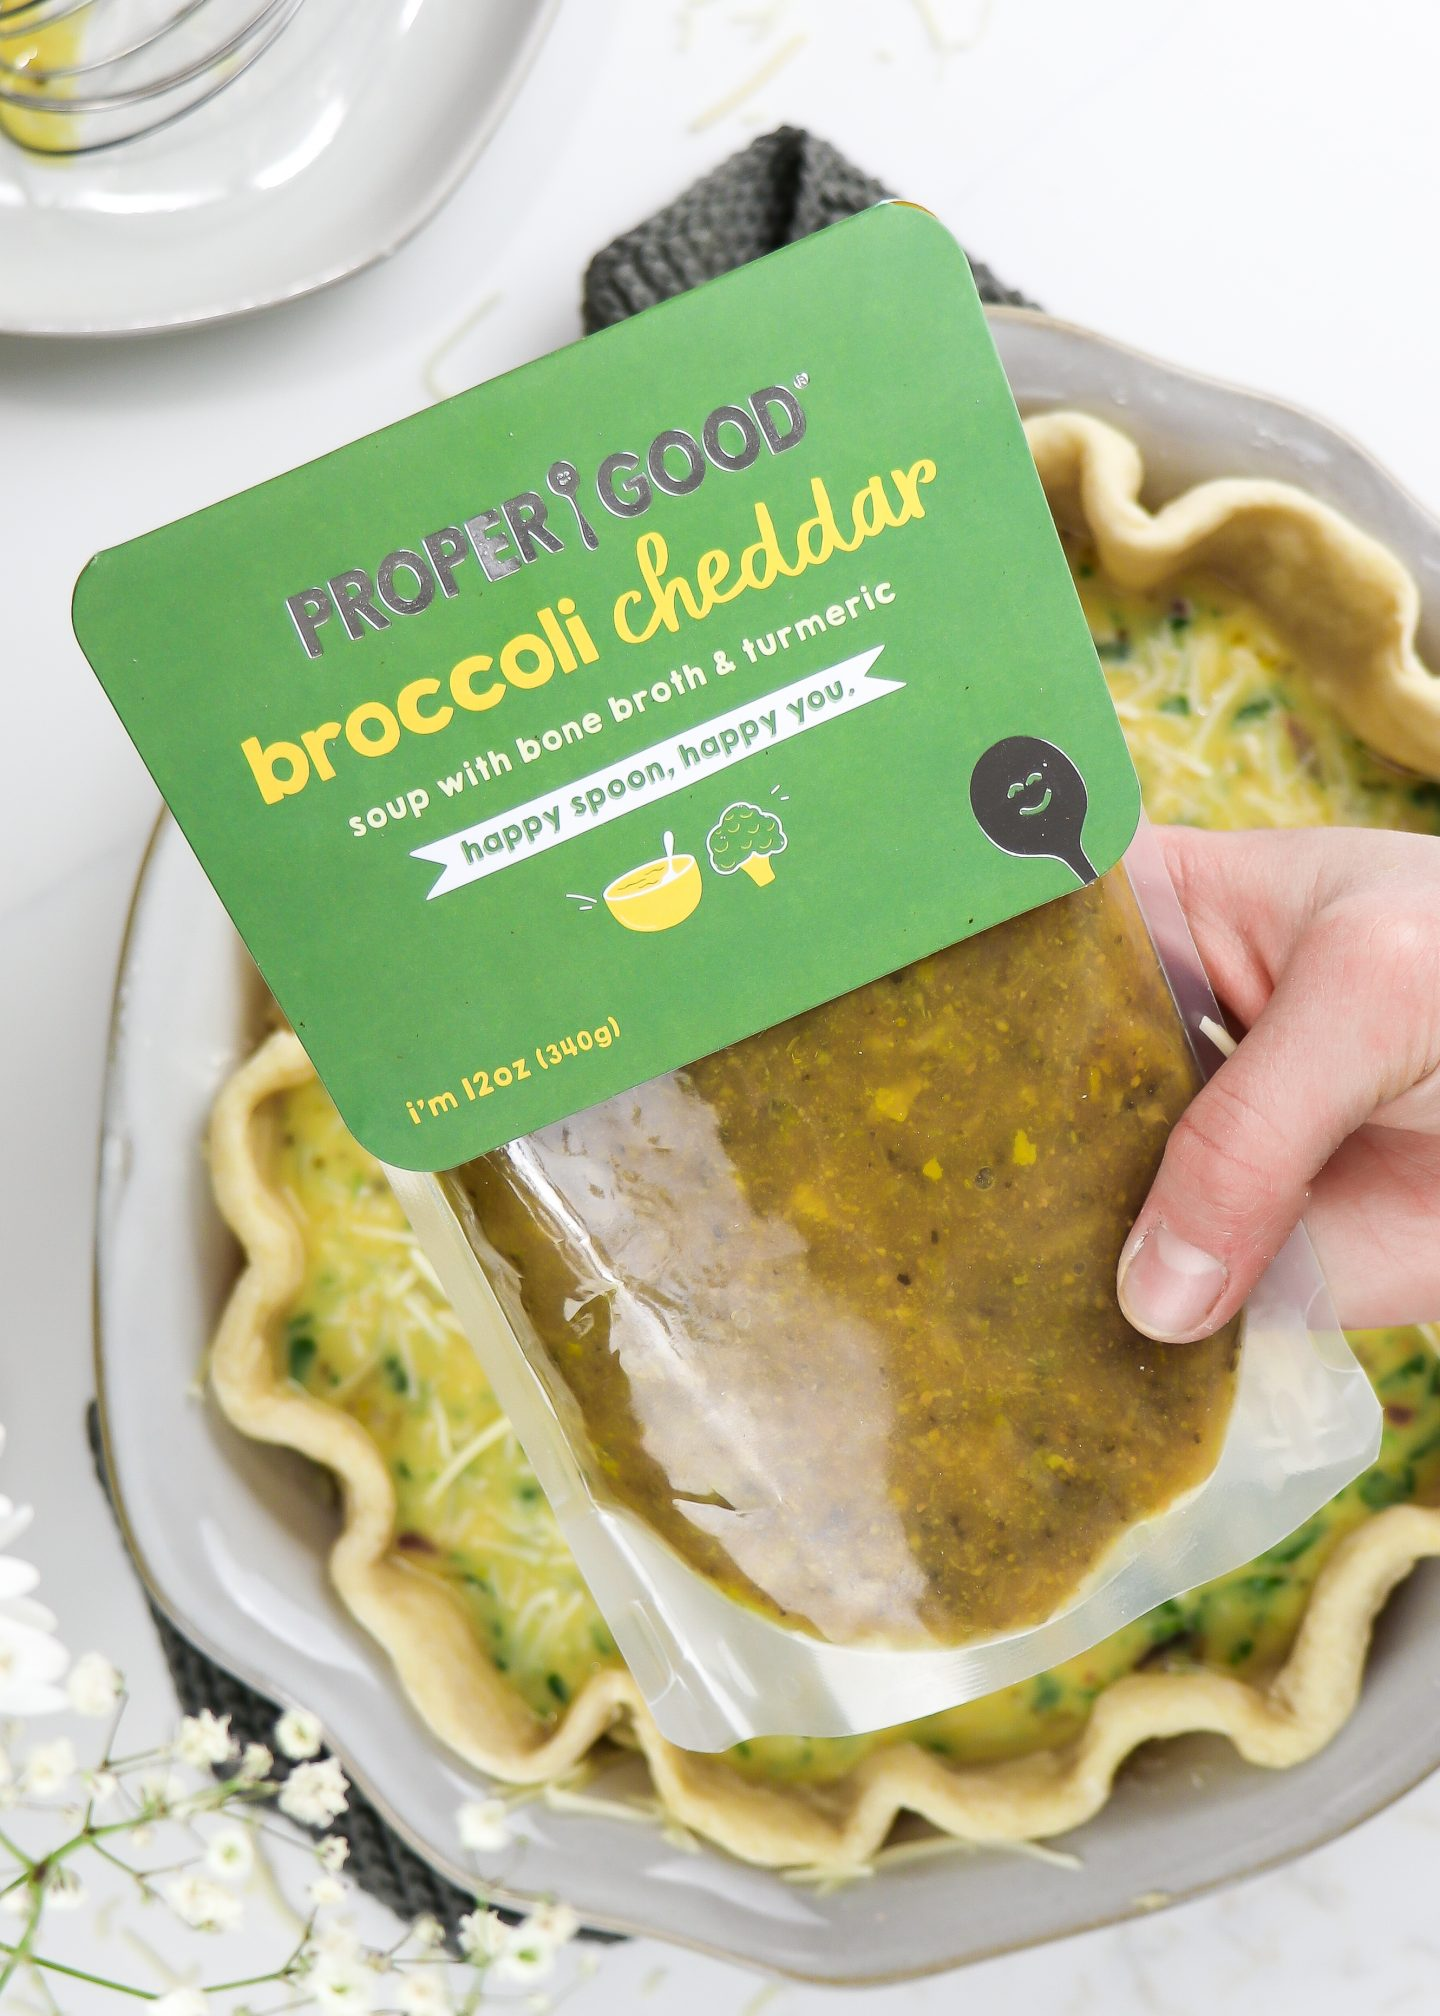 Healthy Broccoli Cheddar & Bacon Quiche